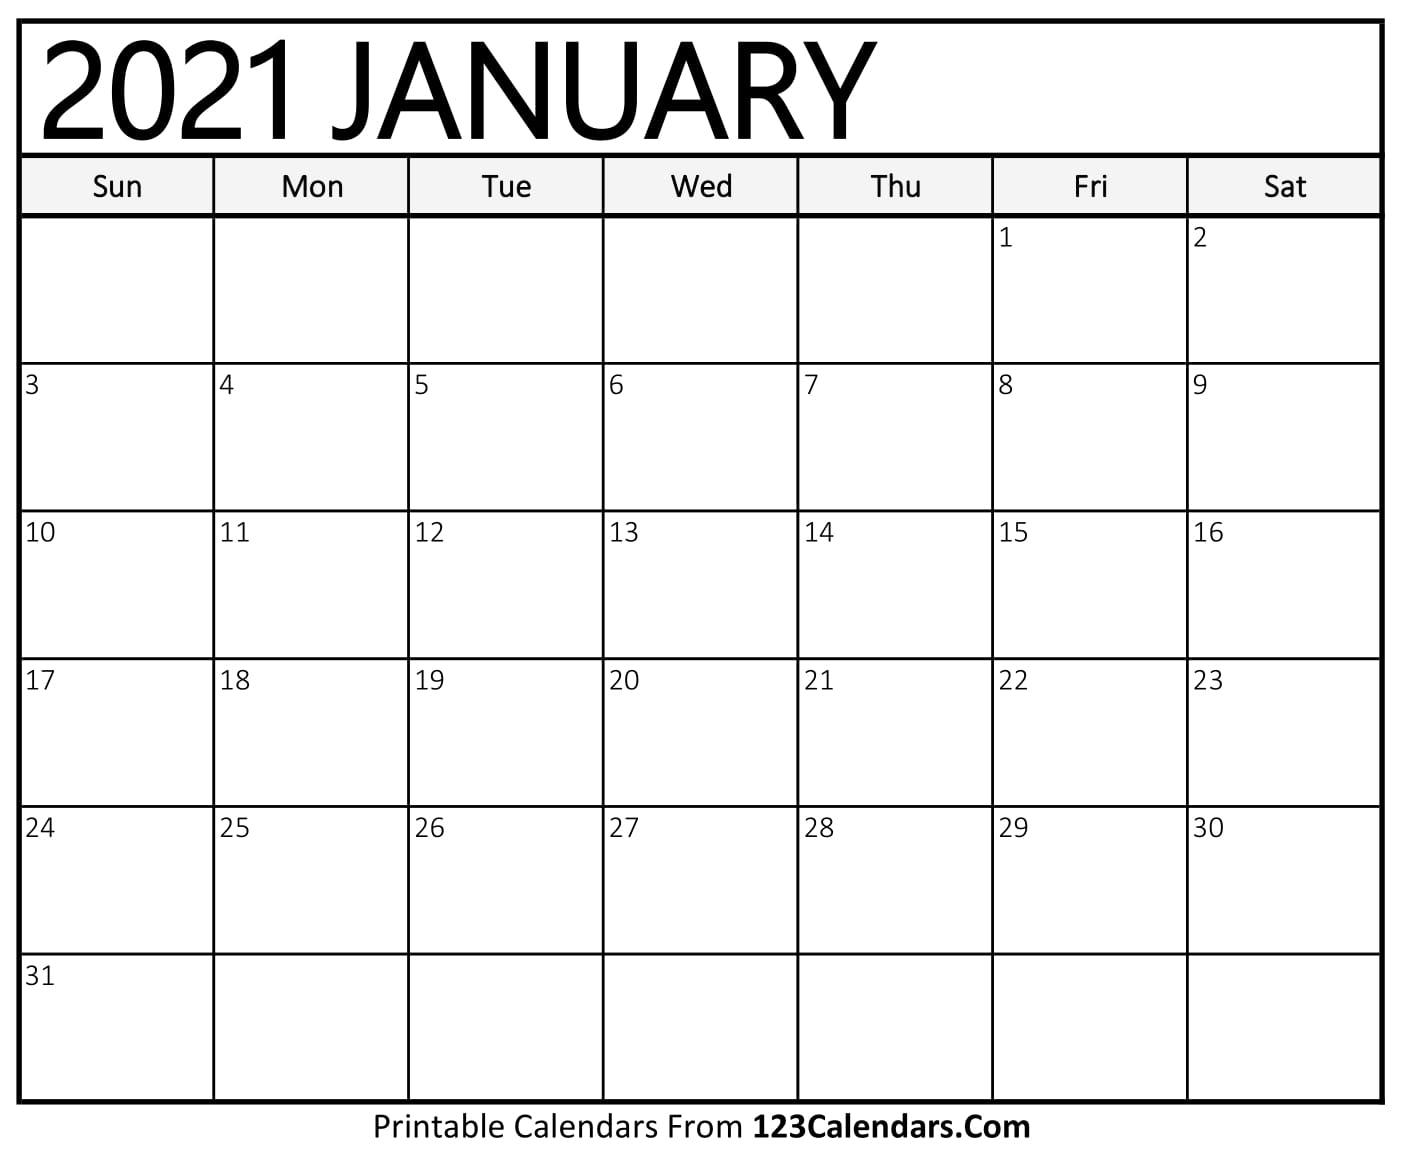 2021 Printable Calendar   123Calendars